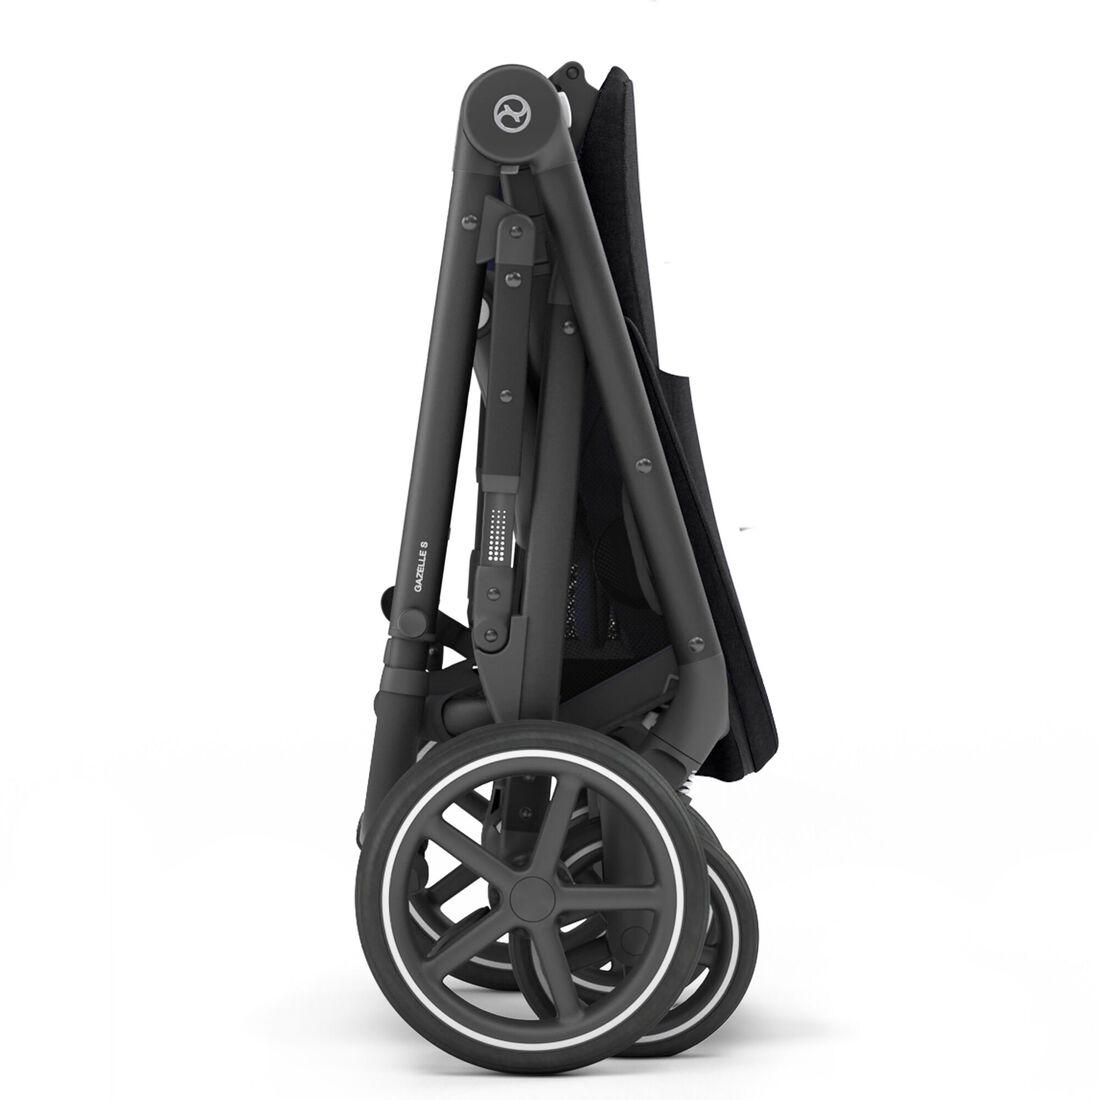 CYBEX Gazelle S - Deep Black (Schwarzer Rahmen) in Deep Black (Black Frame) large Bild 9